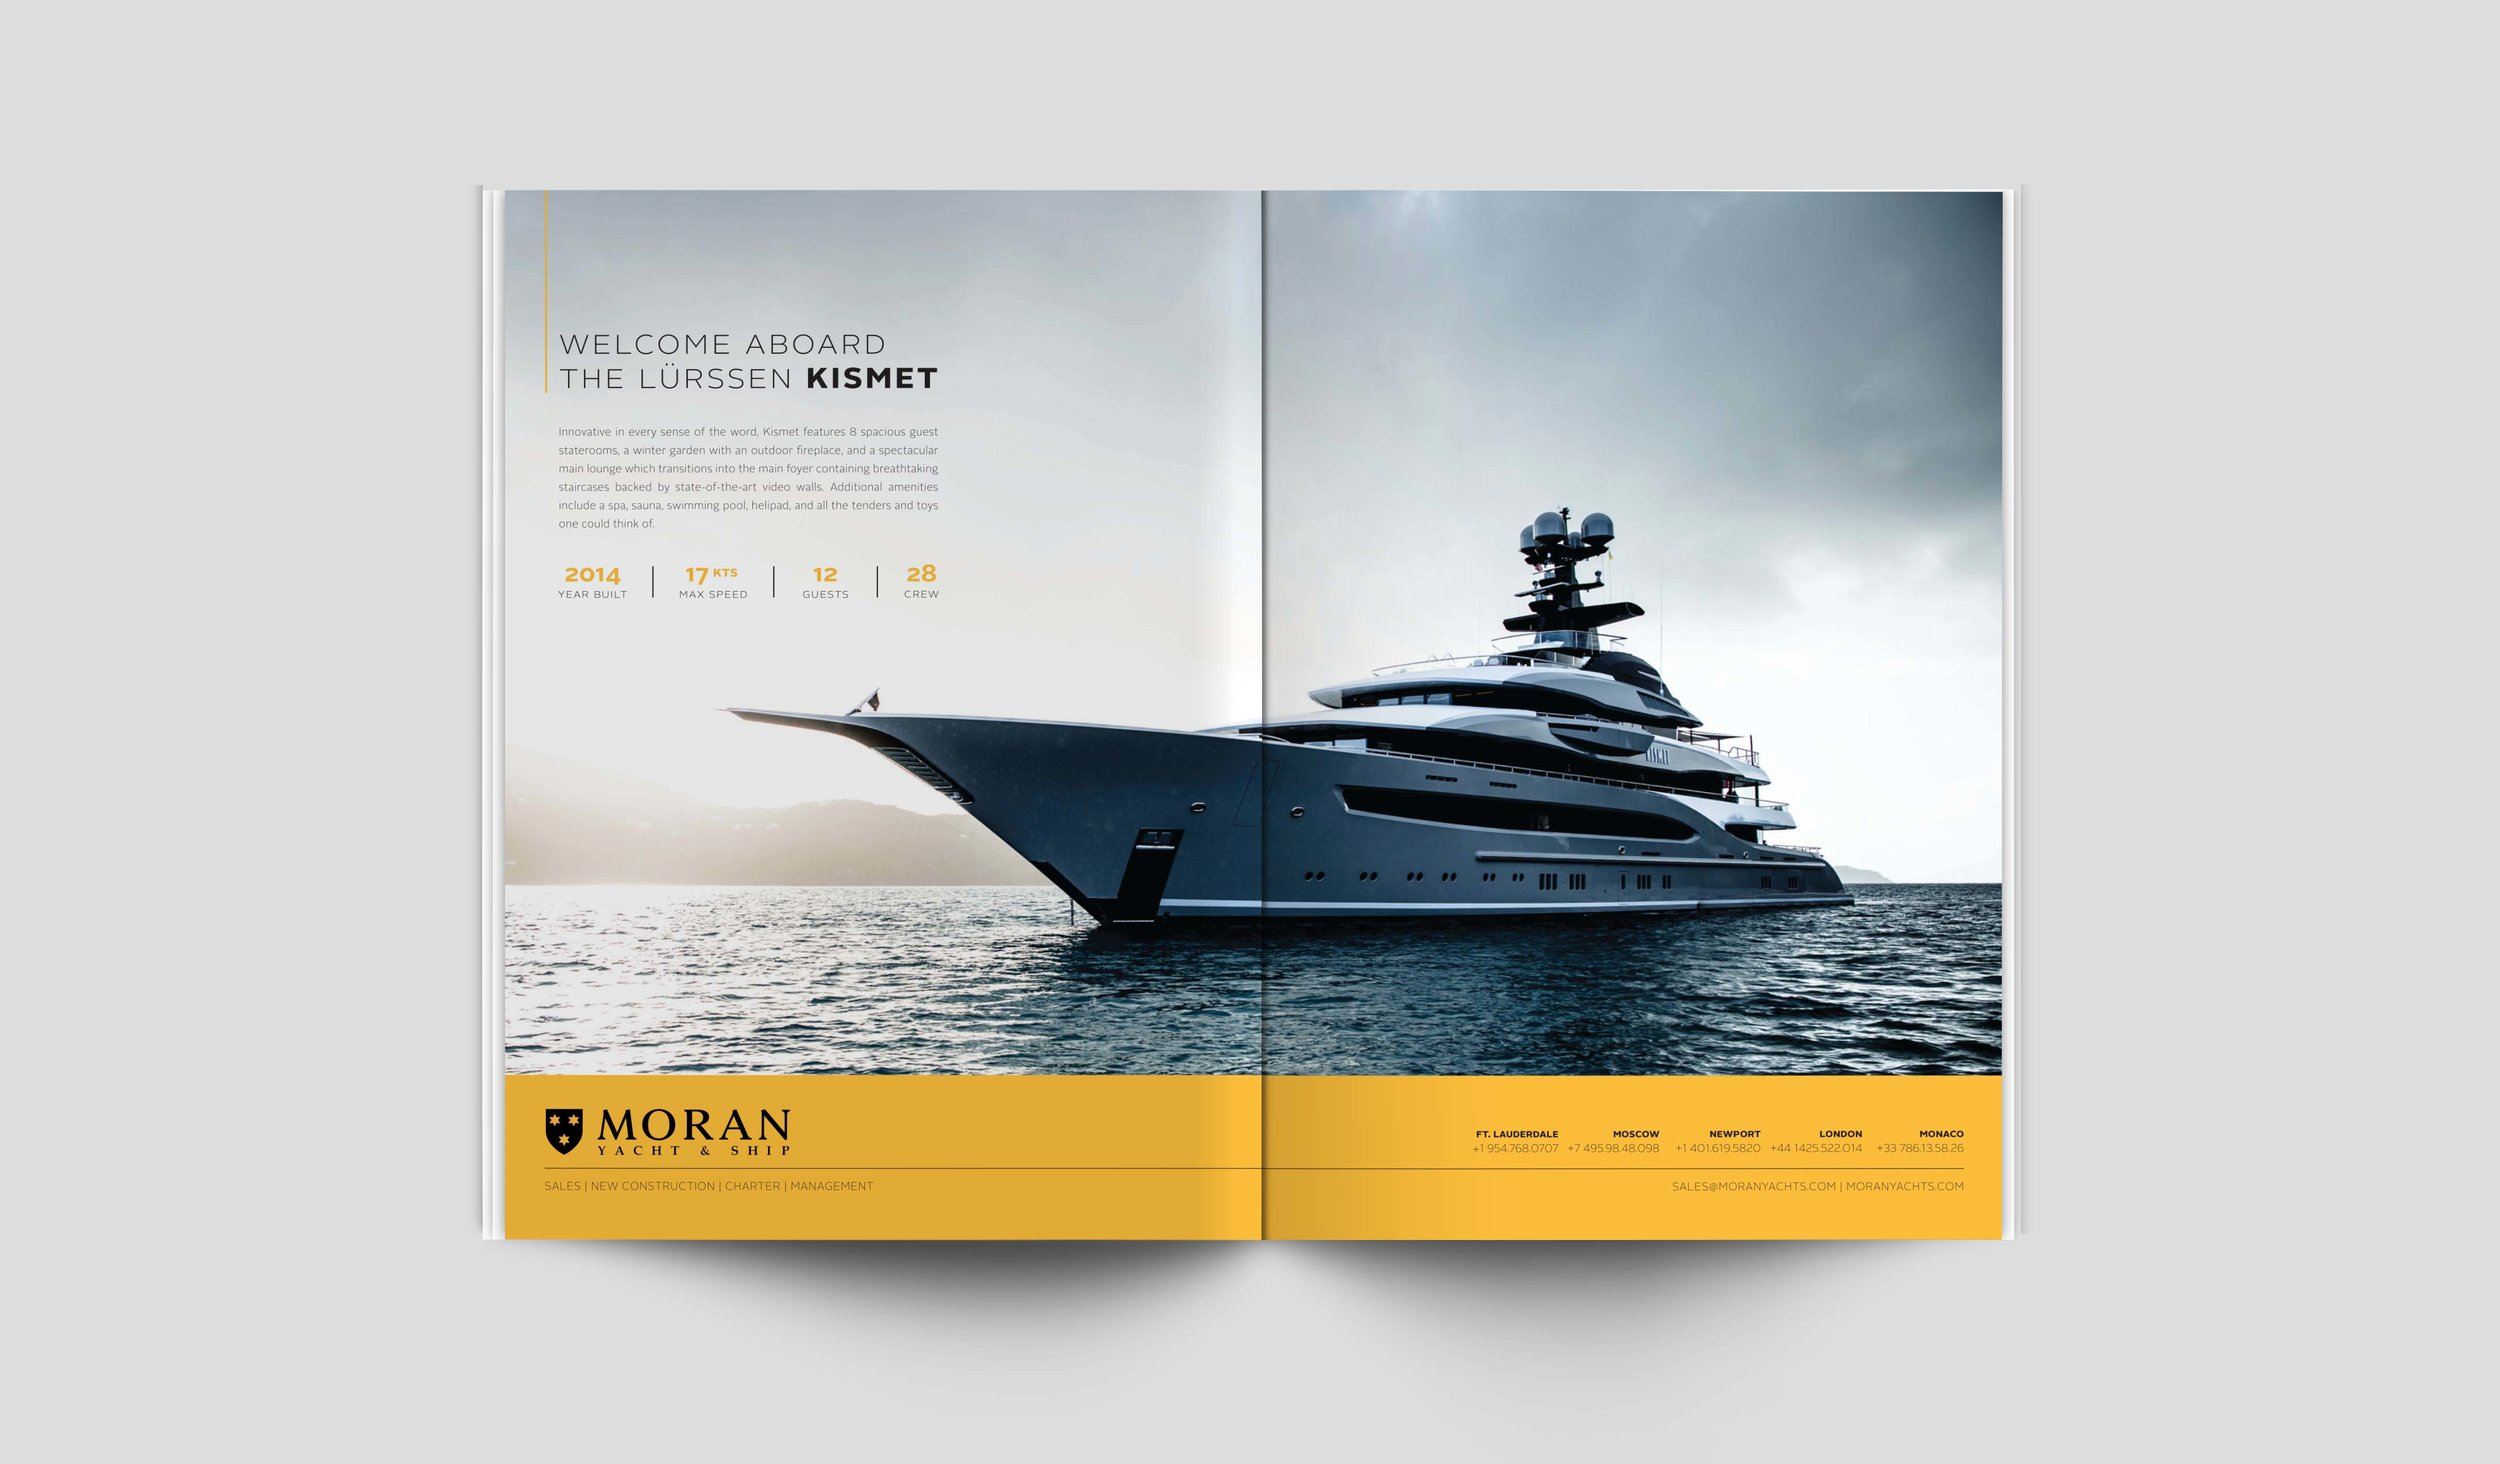 Moran_Company Ad_Spread-3.jpg